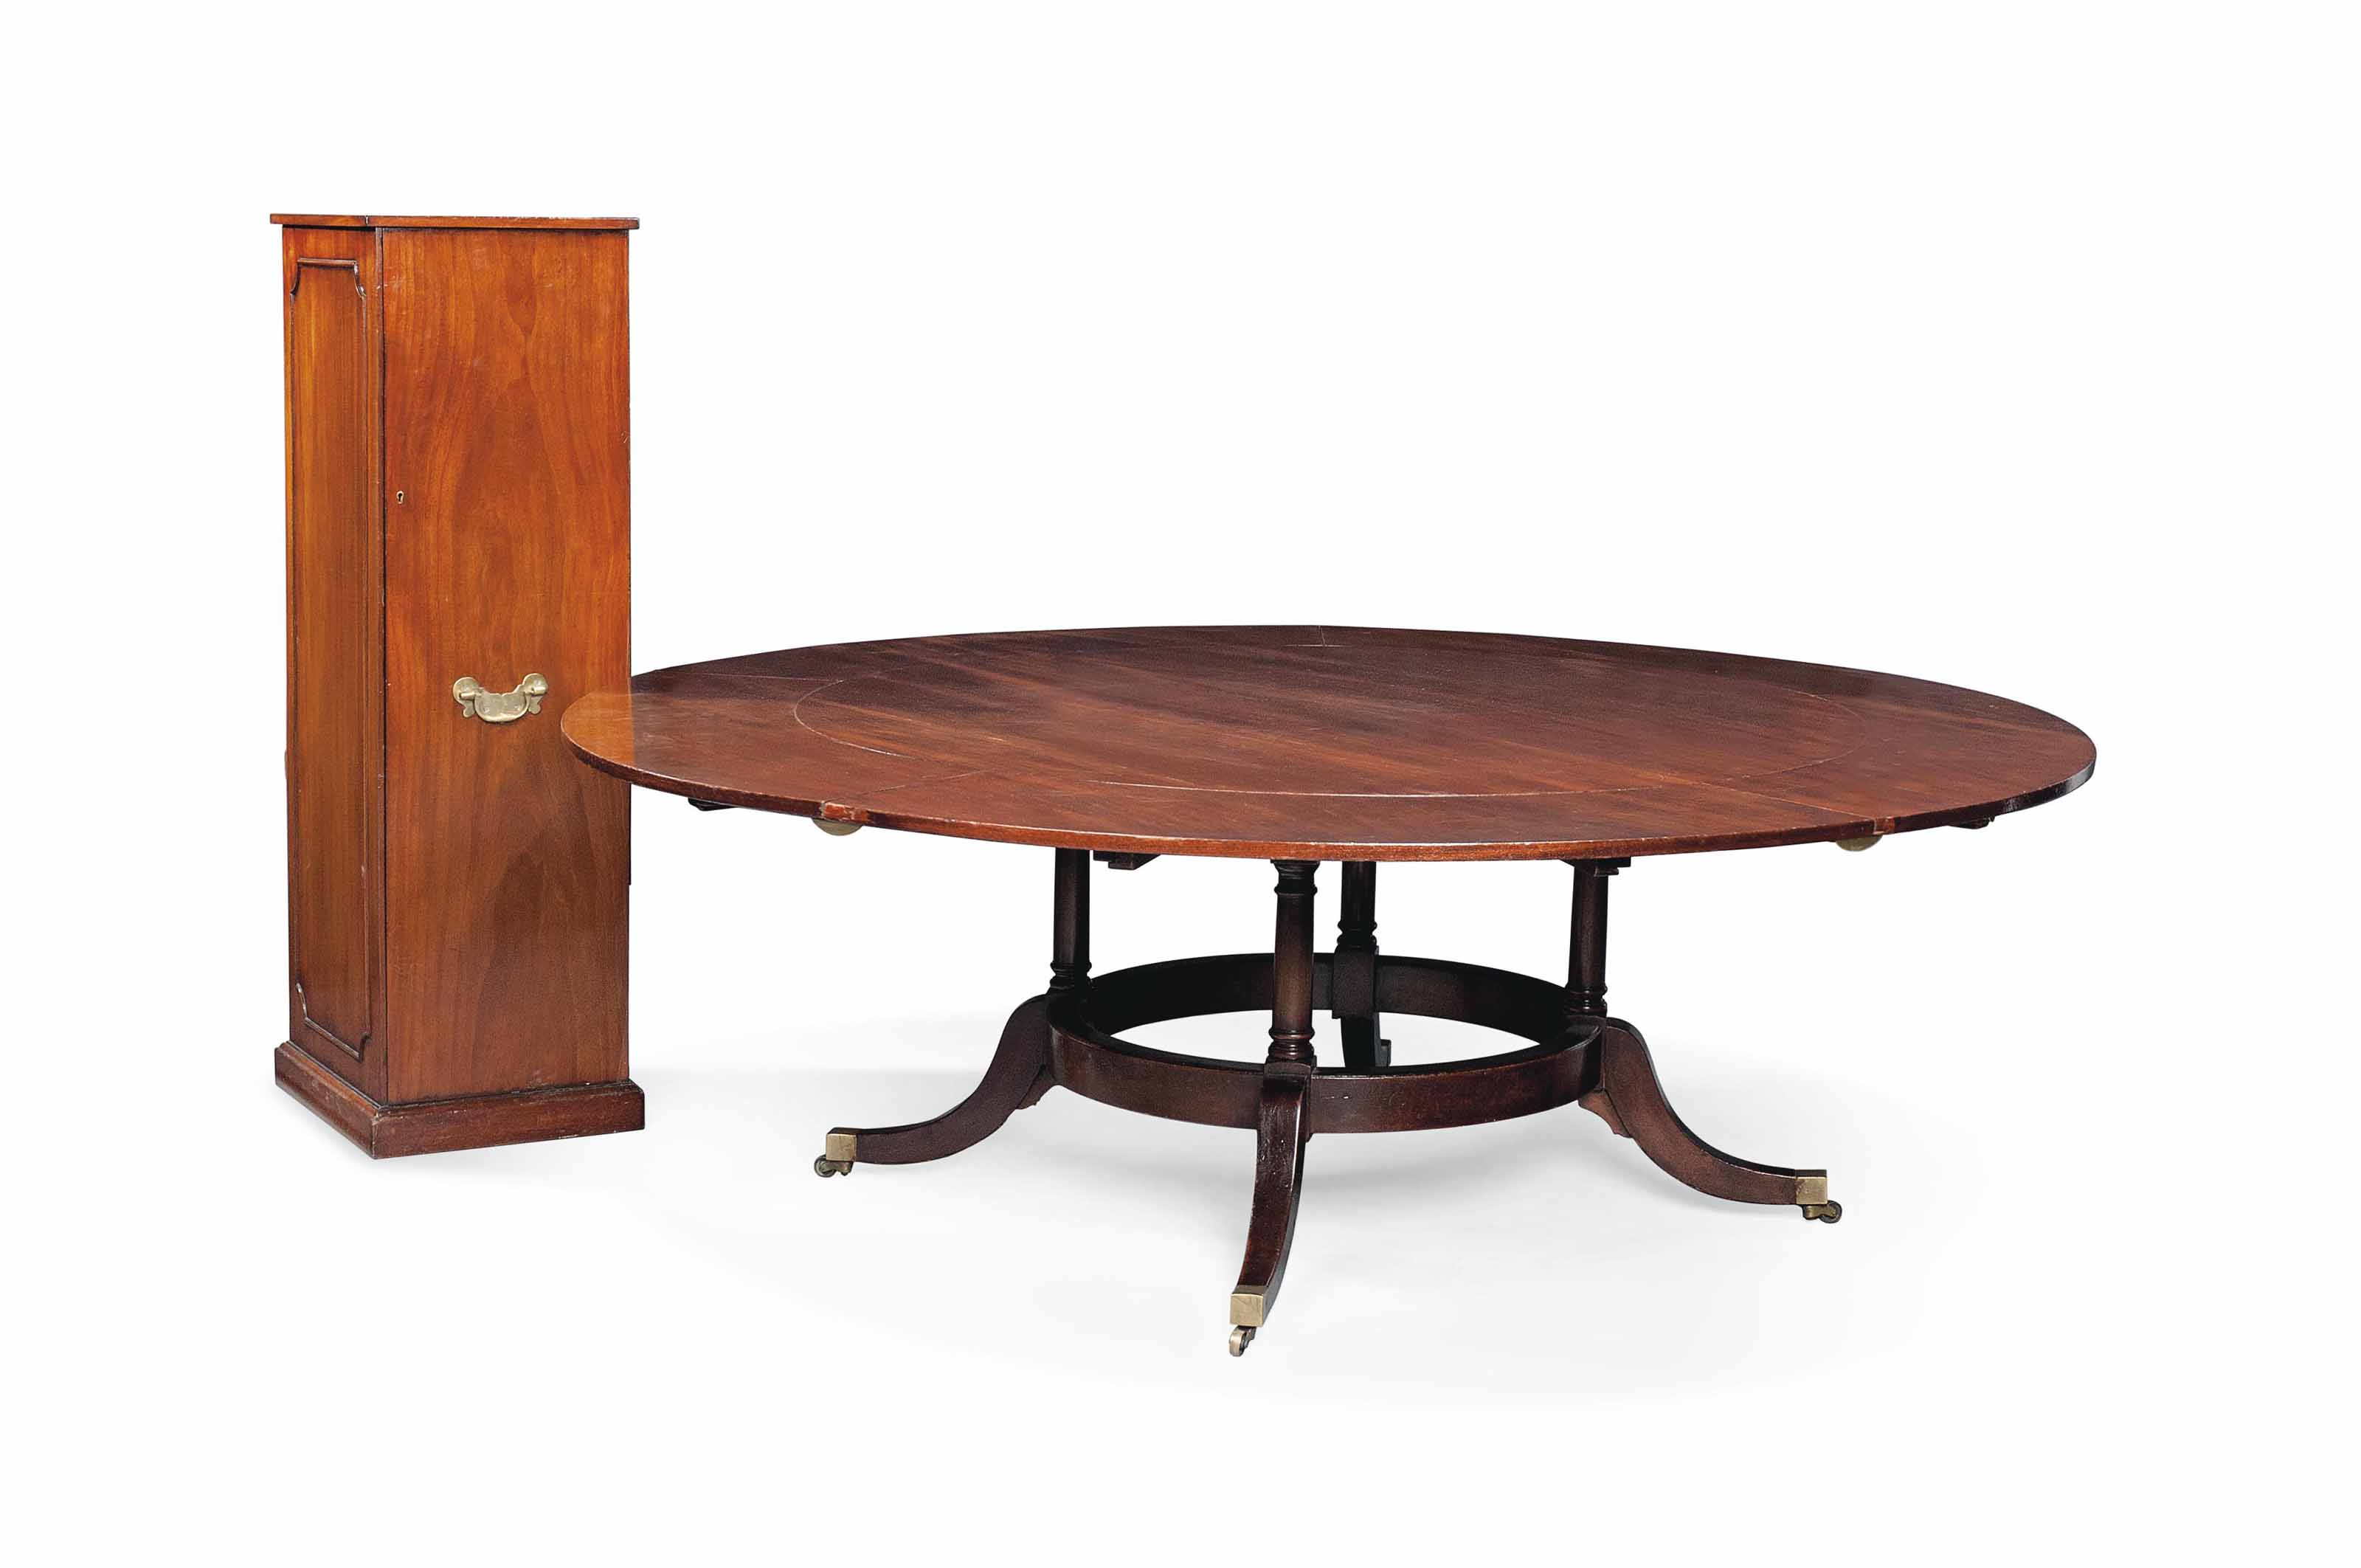 A MAHOGANY CIRCULAR EXTENDING TABLE